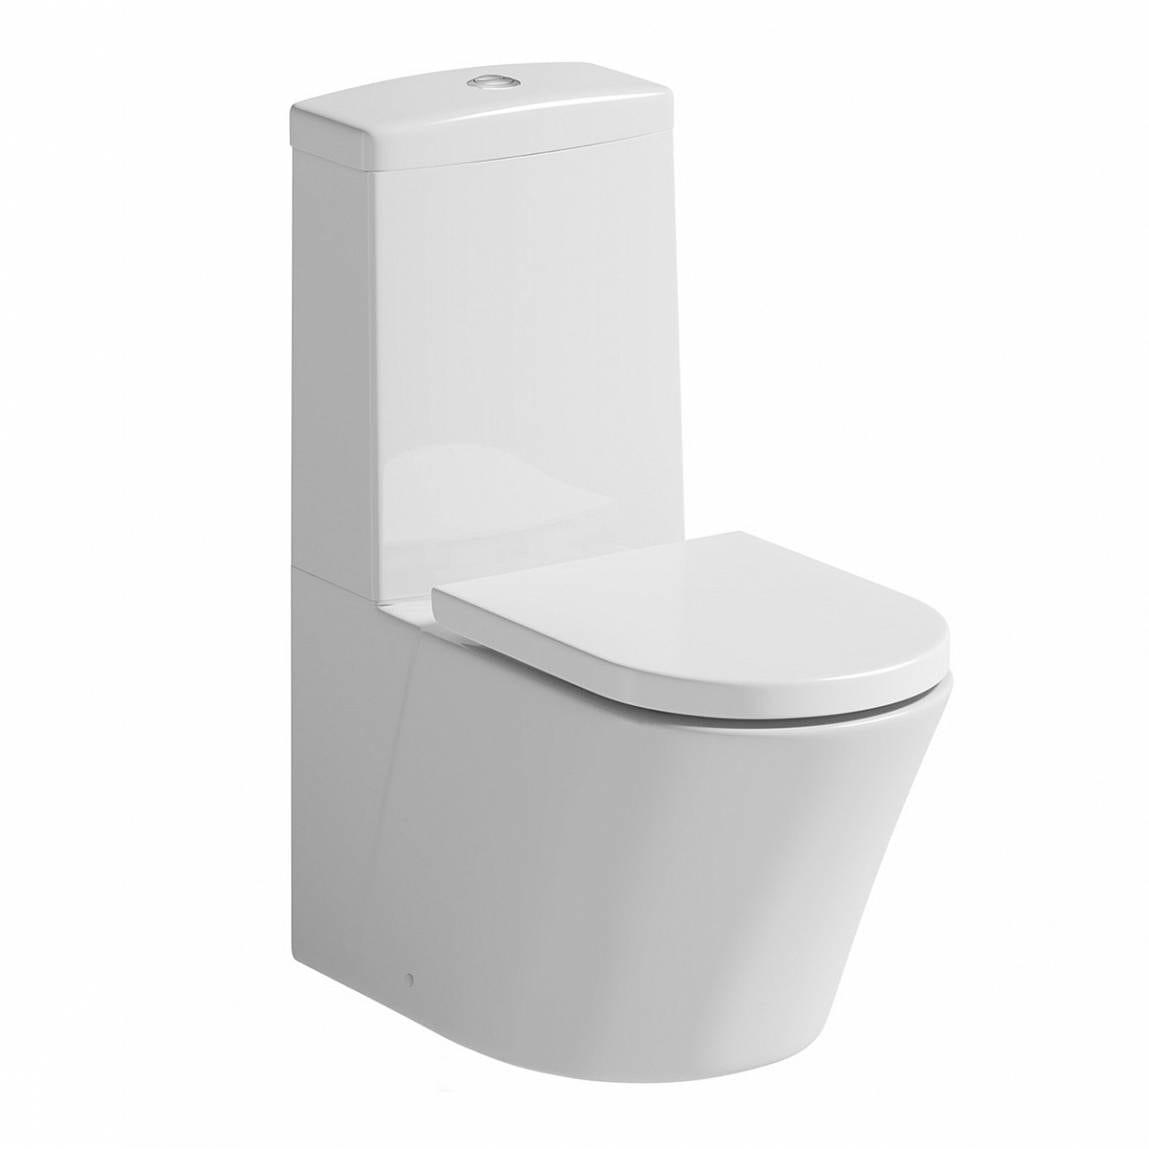 Arte Close Coupled Toilet inc. Quick Release Soft Close Seat